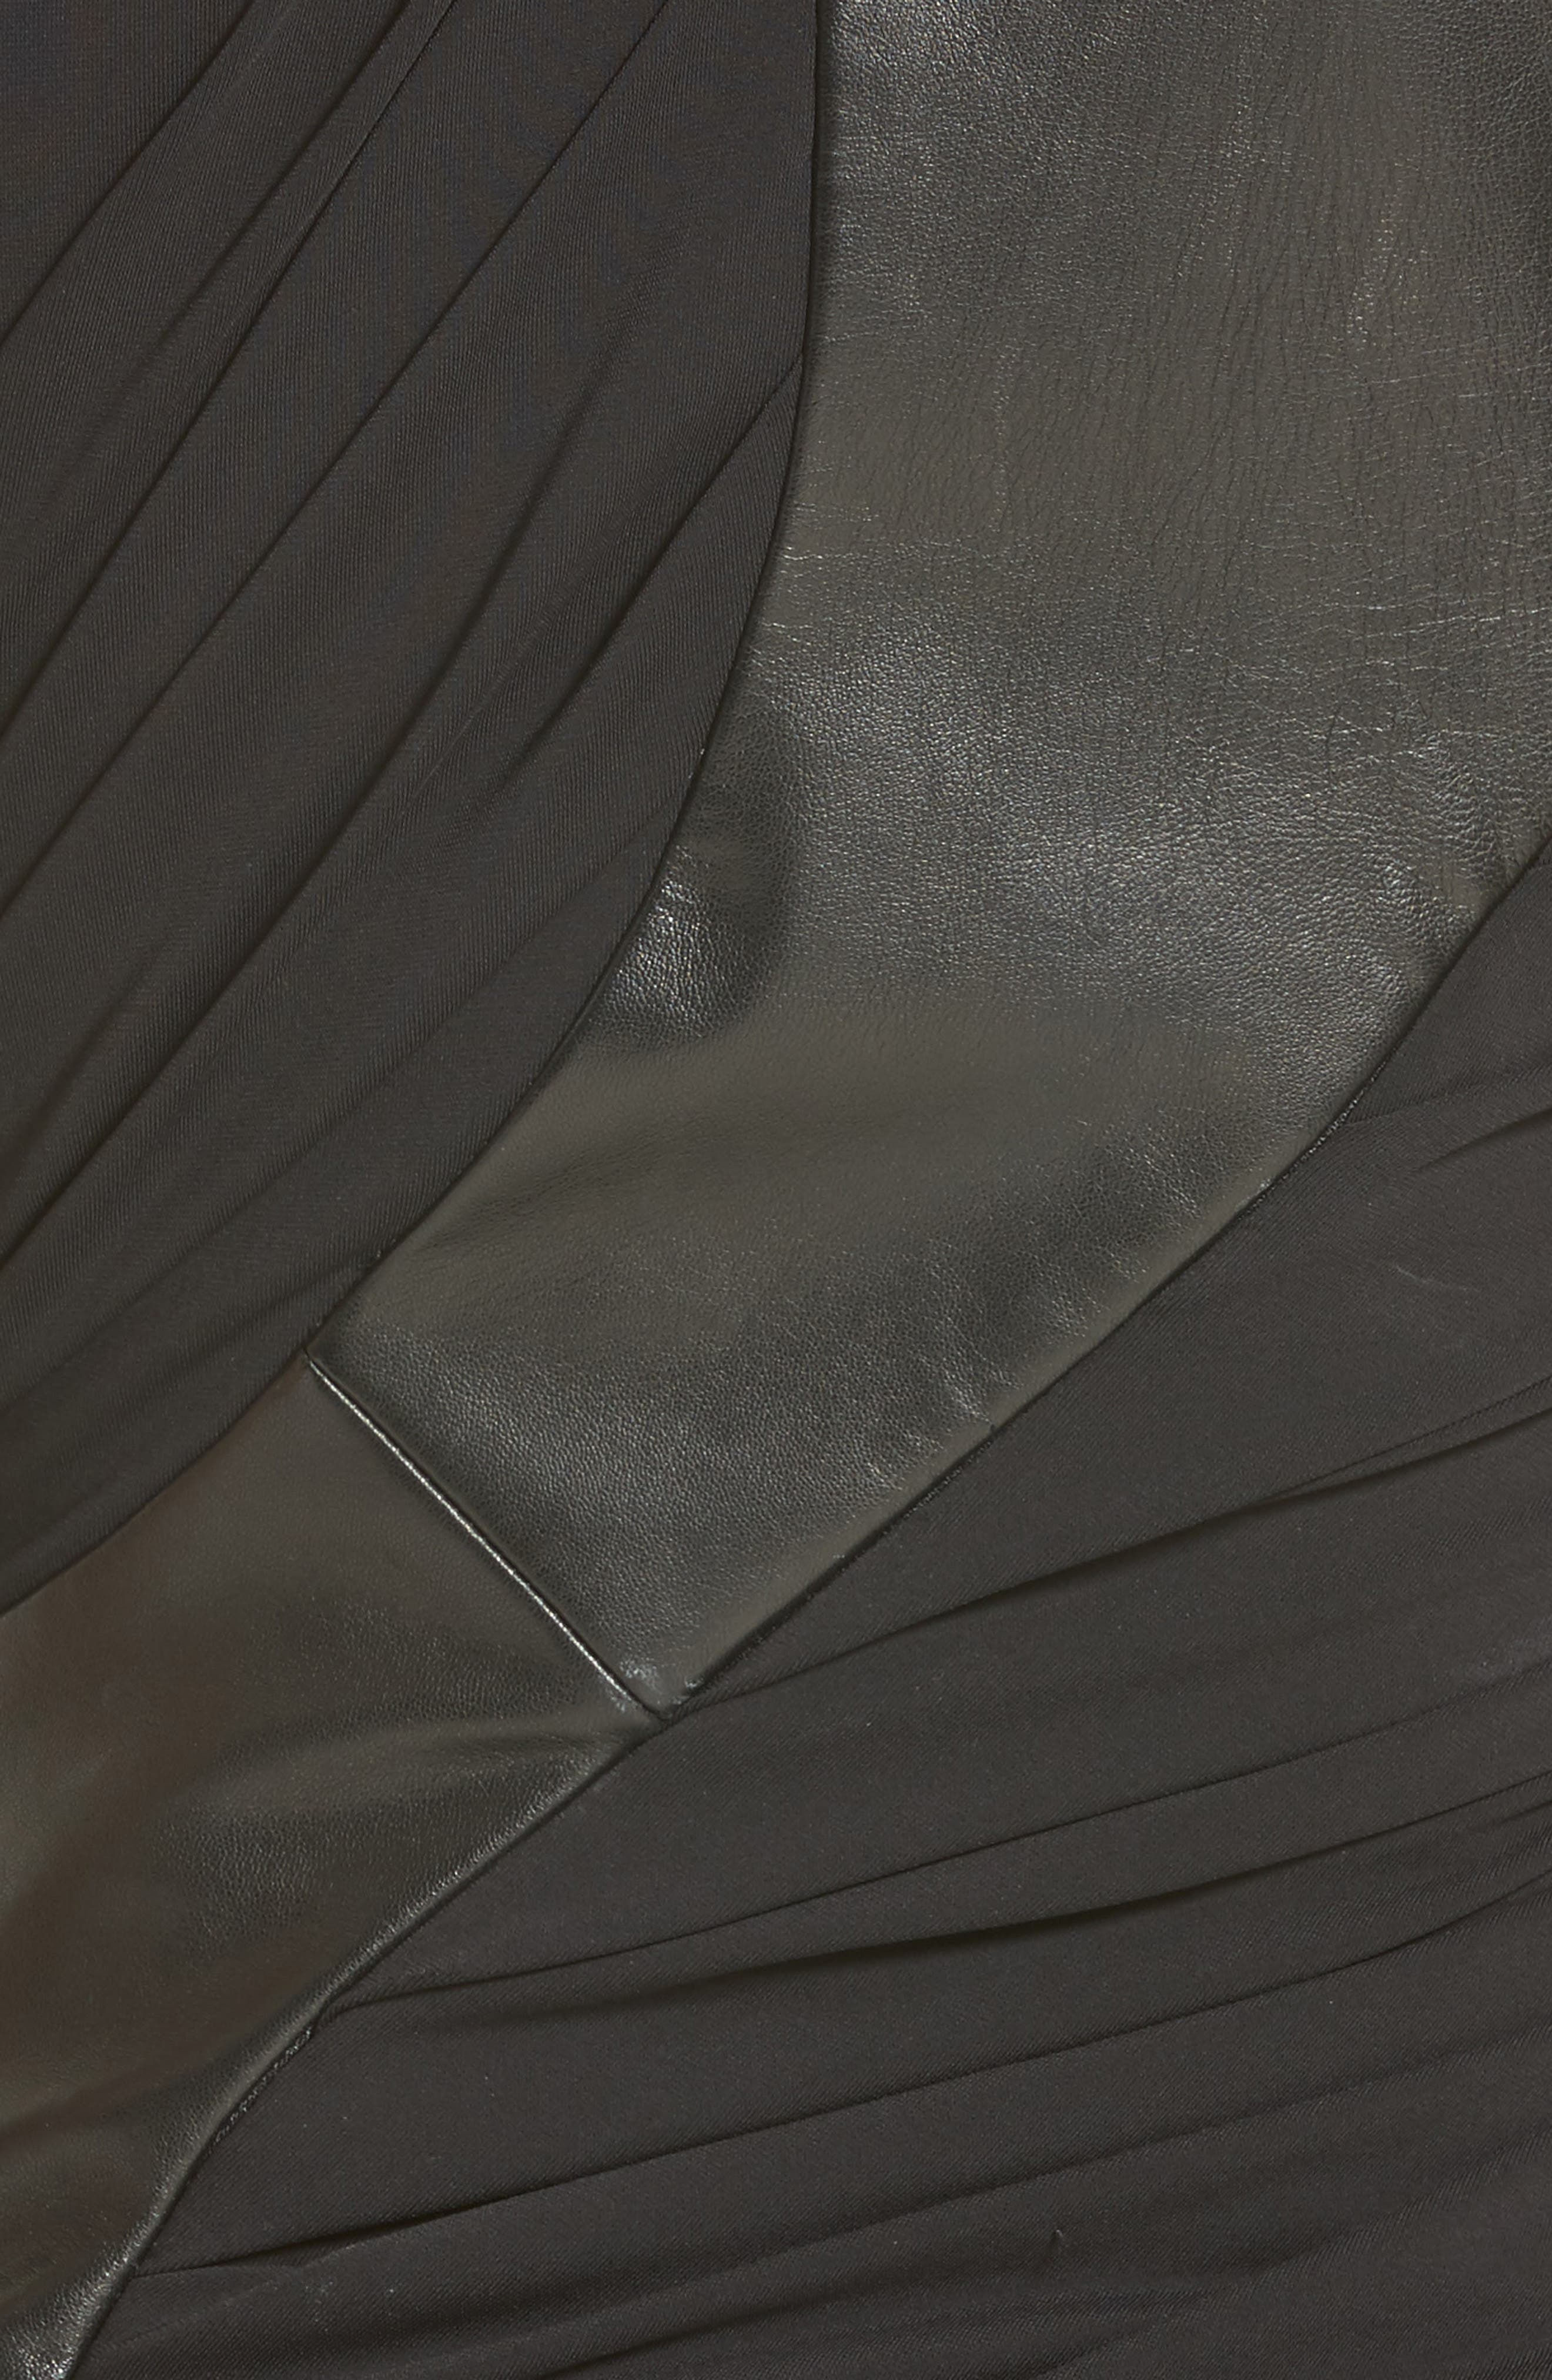 Draped Jersey & Leather Dress,                             Alternate thumbnail 5, color,                             001